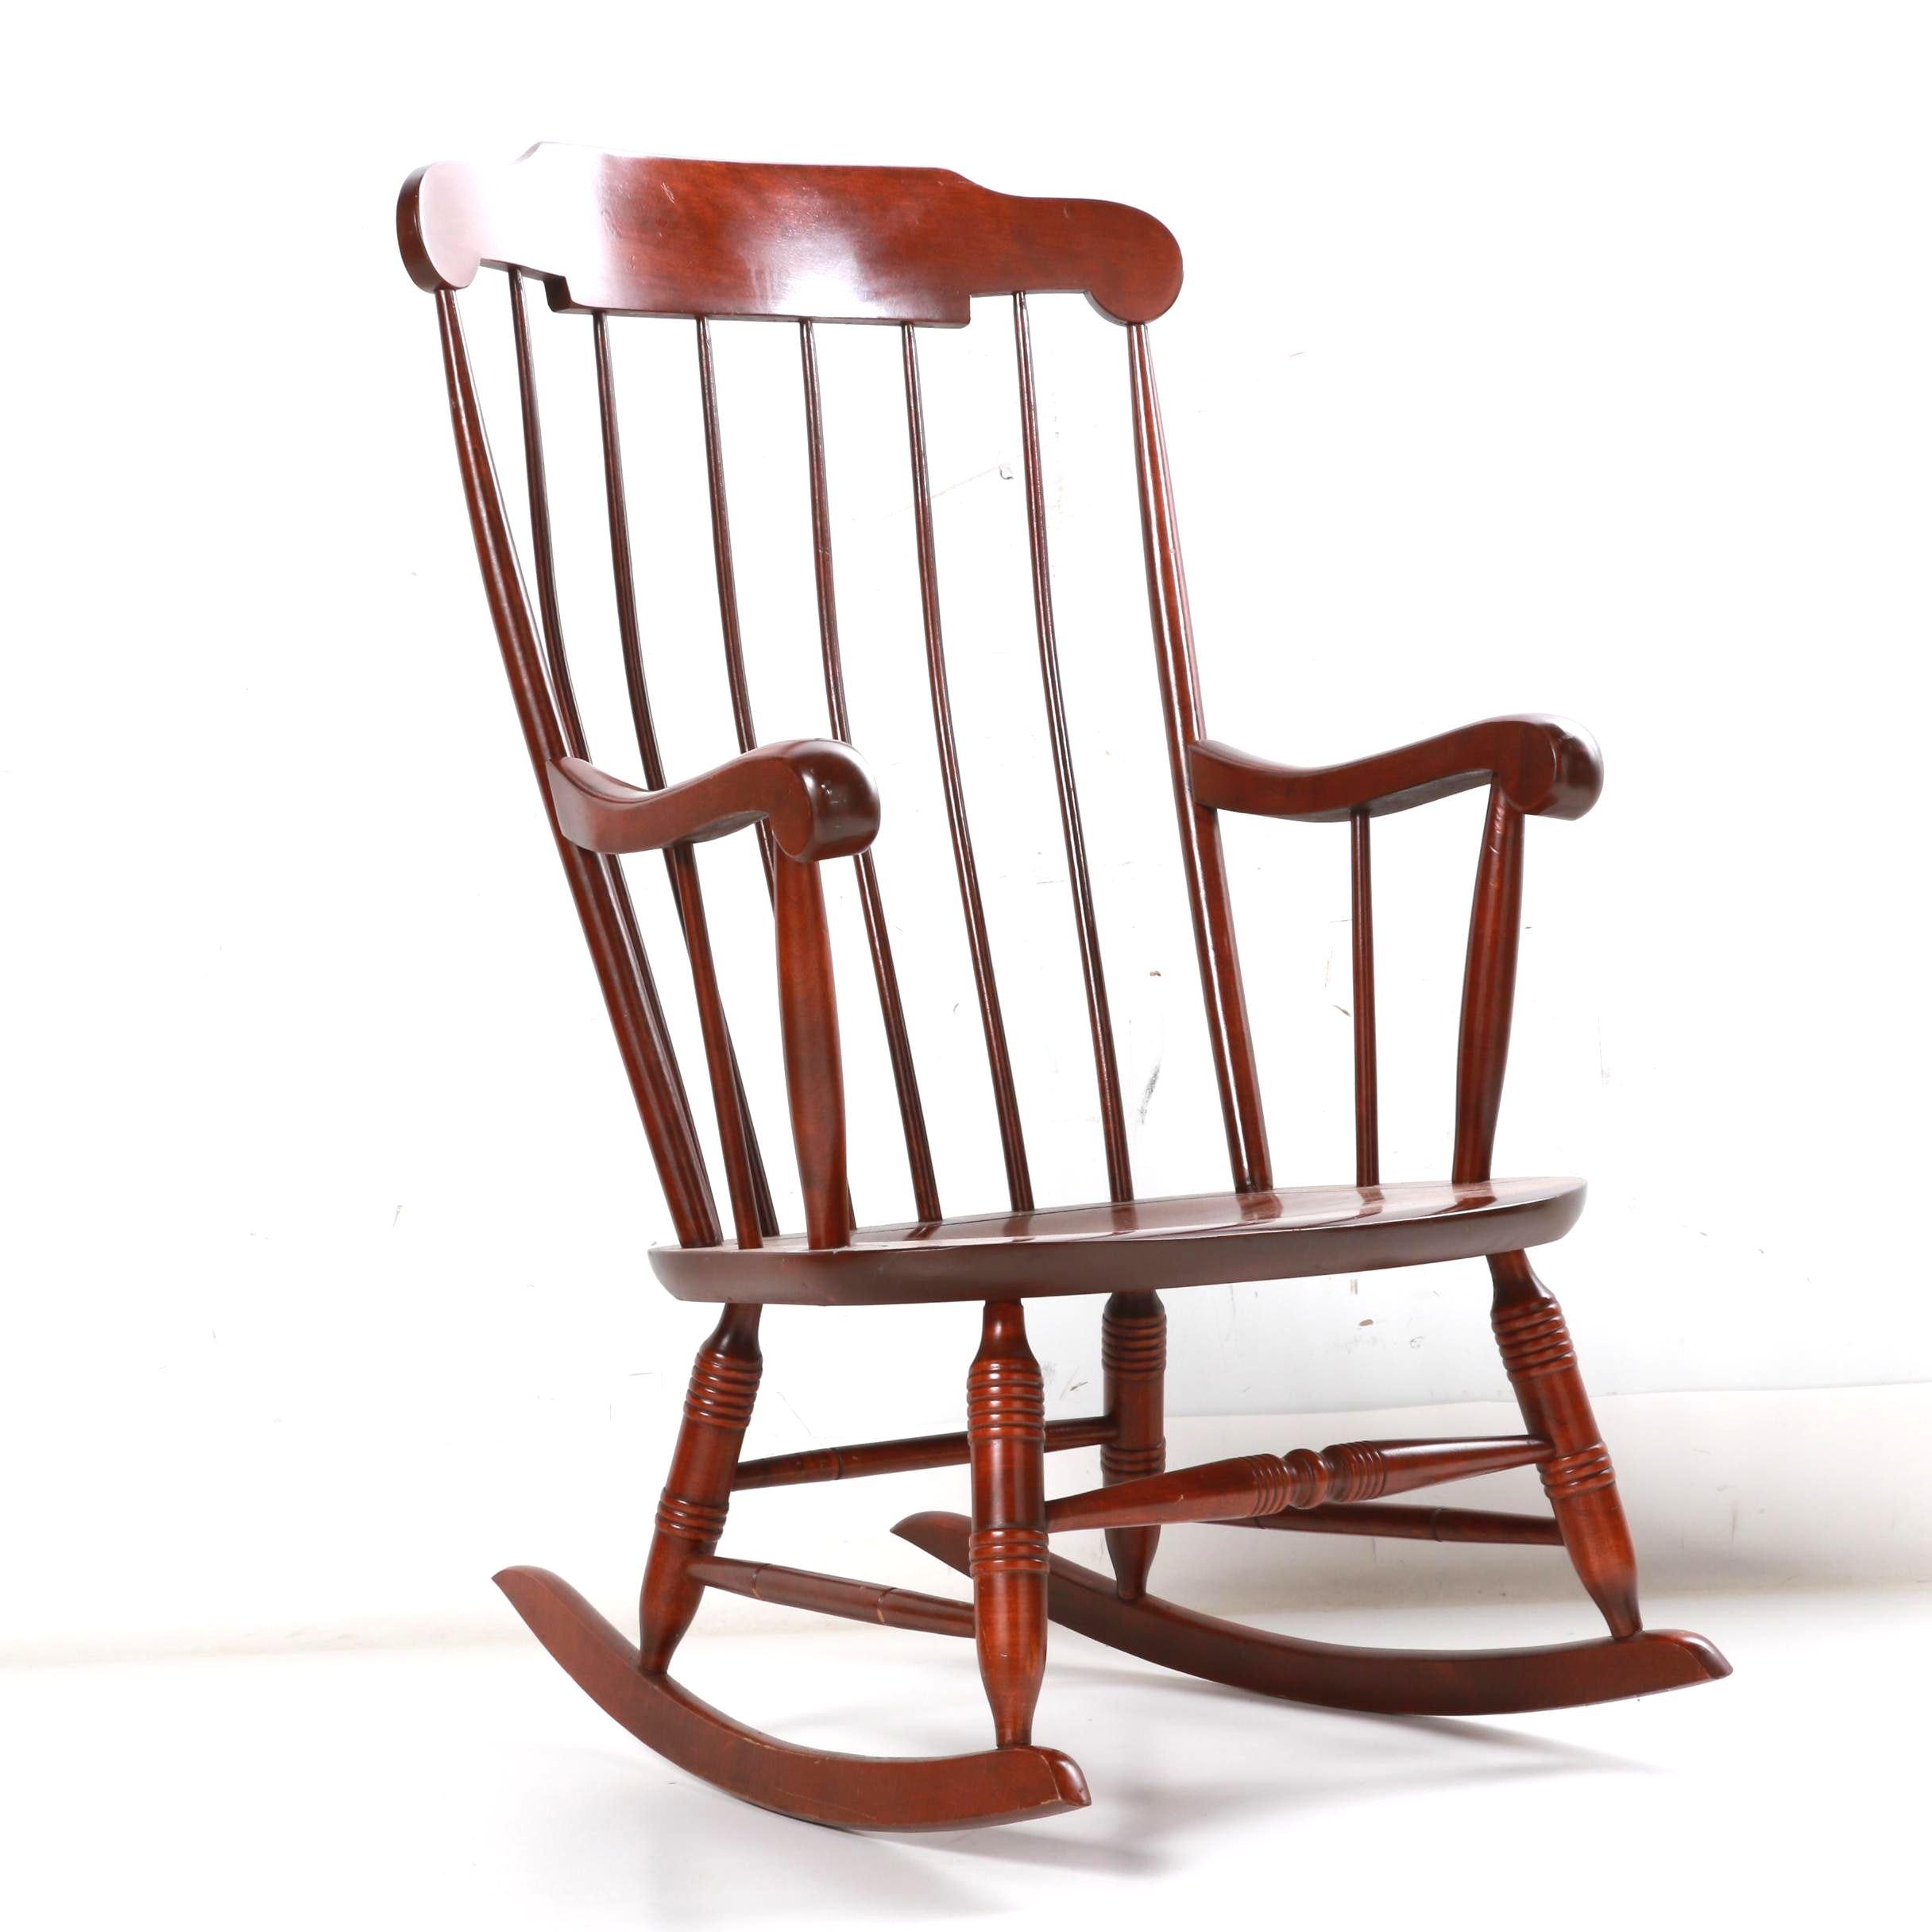 Cherry Rocking Chair by Nichols & Stone Co.